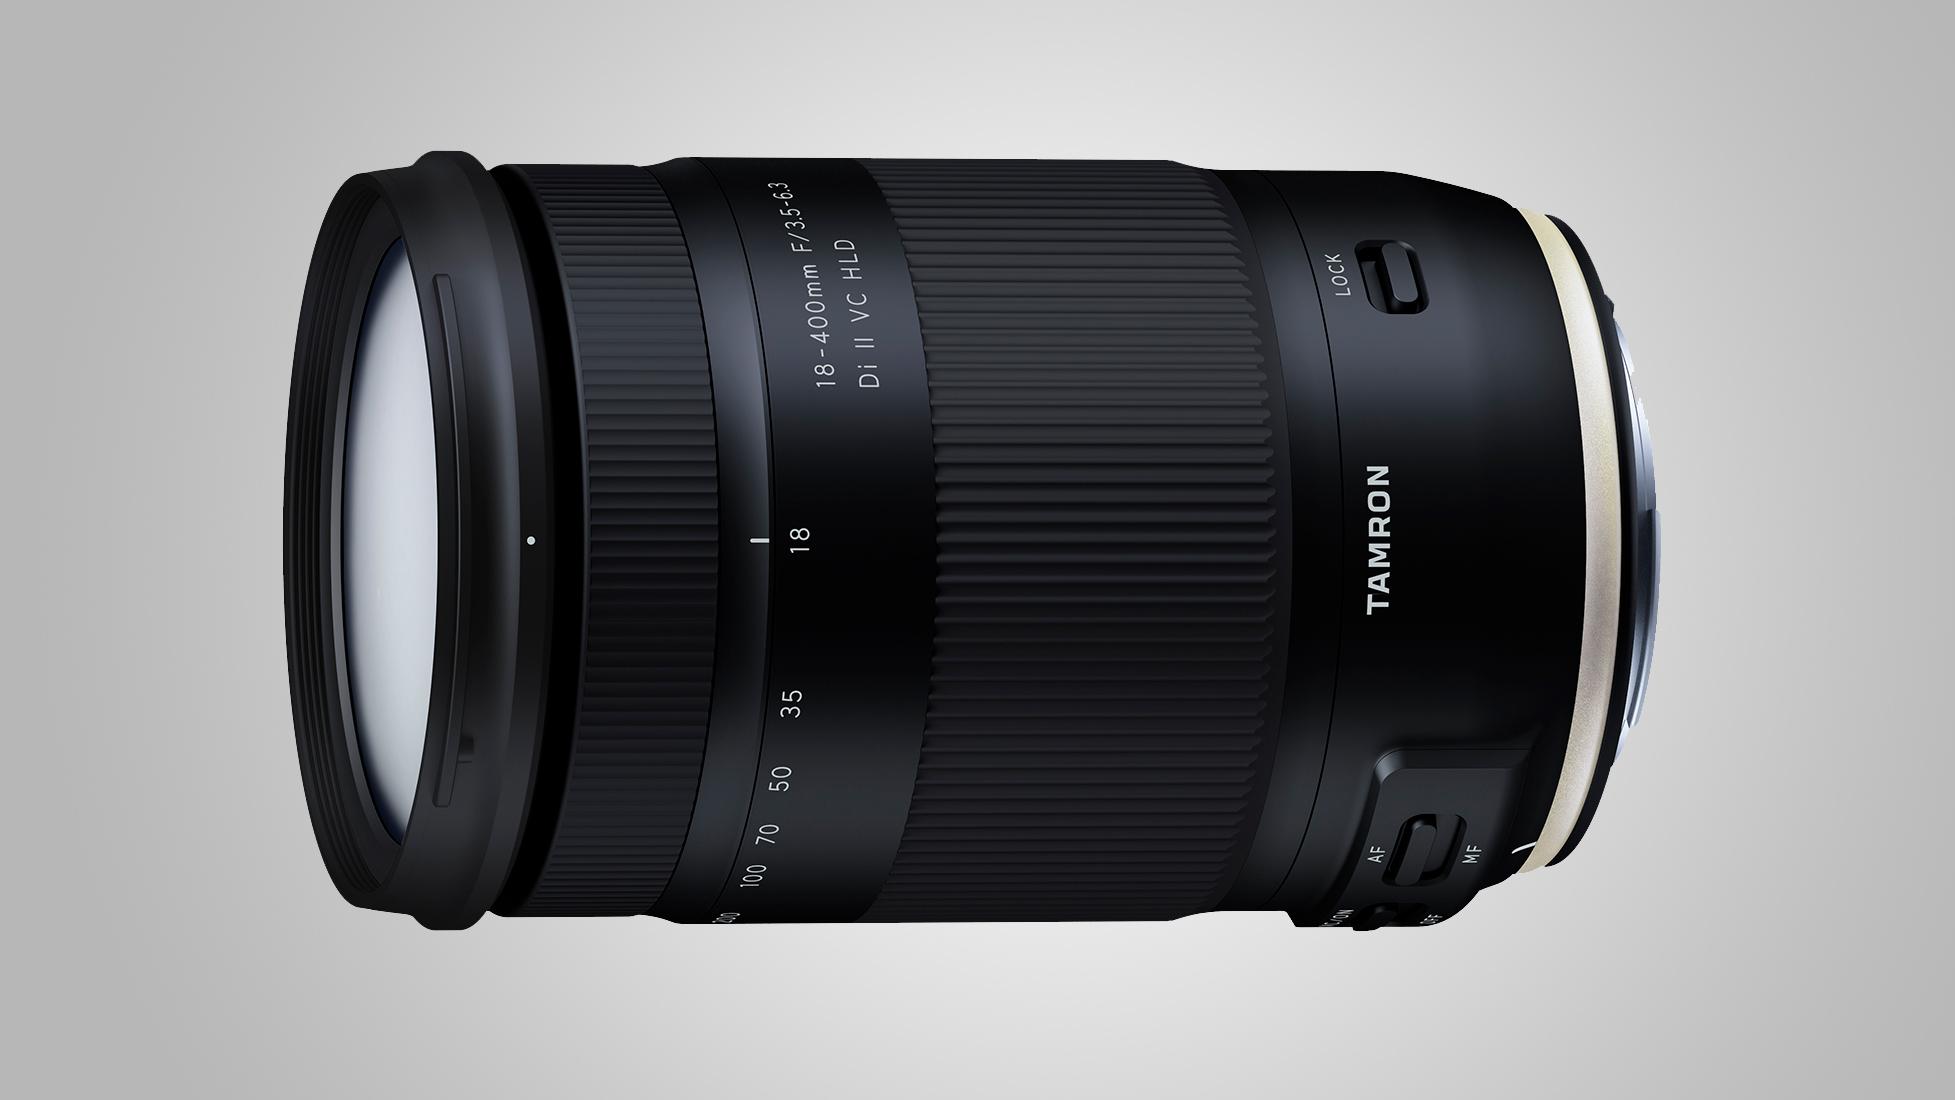 Tamron 18-400mm f/3.5-6.3 Di II VC HLD review | TechRadar